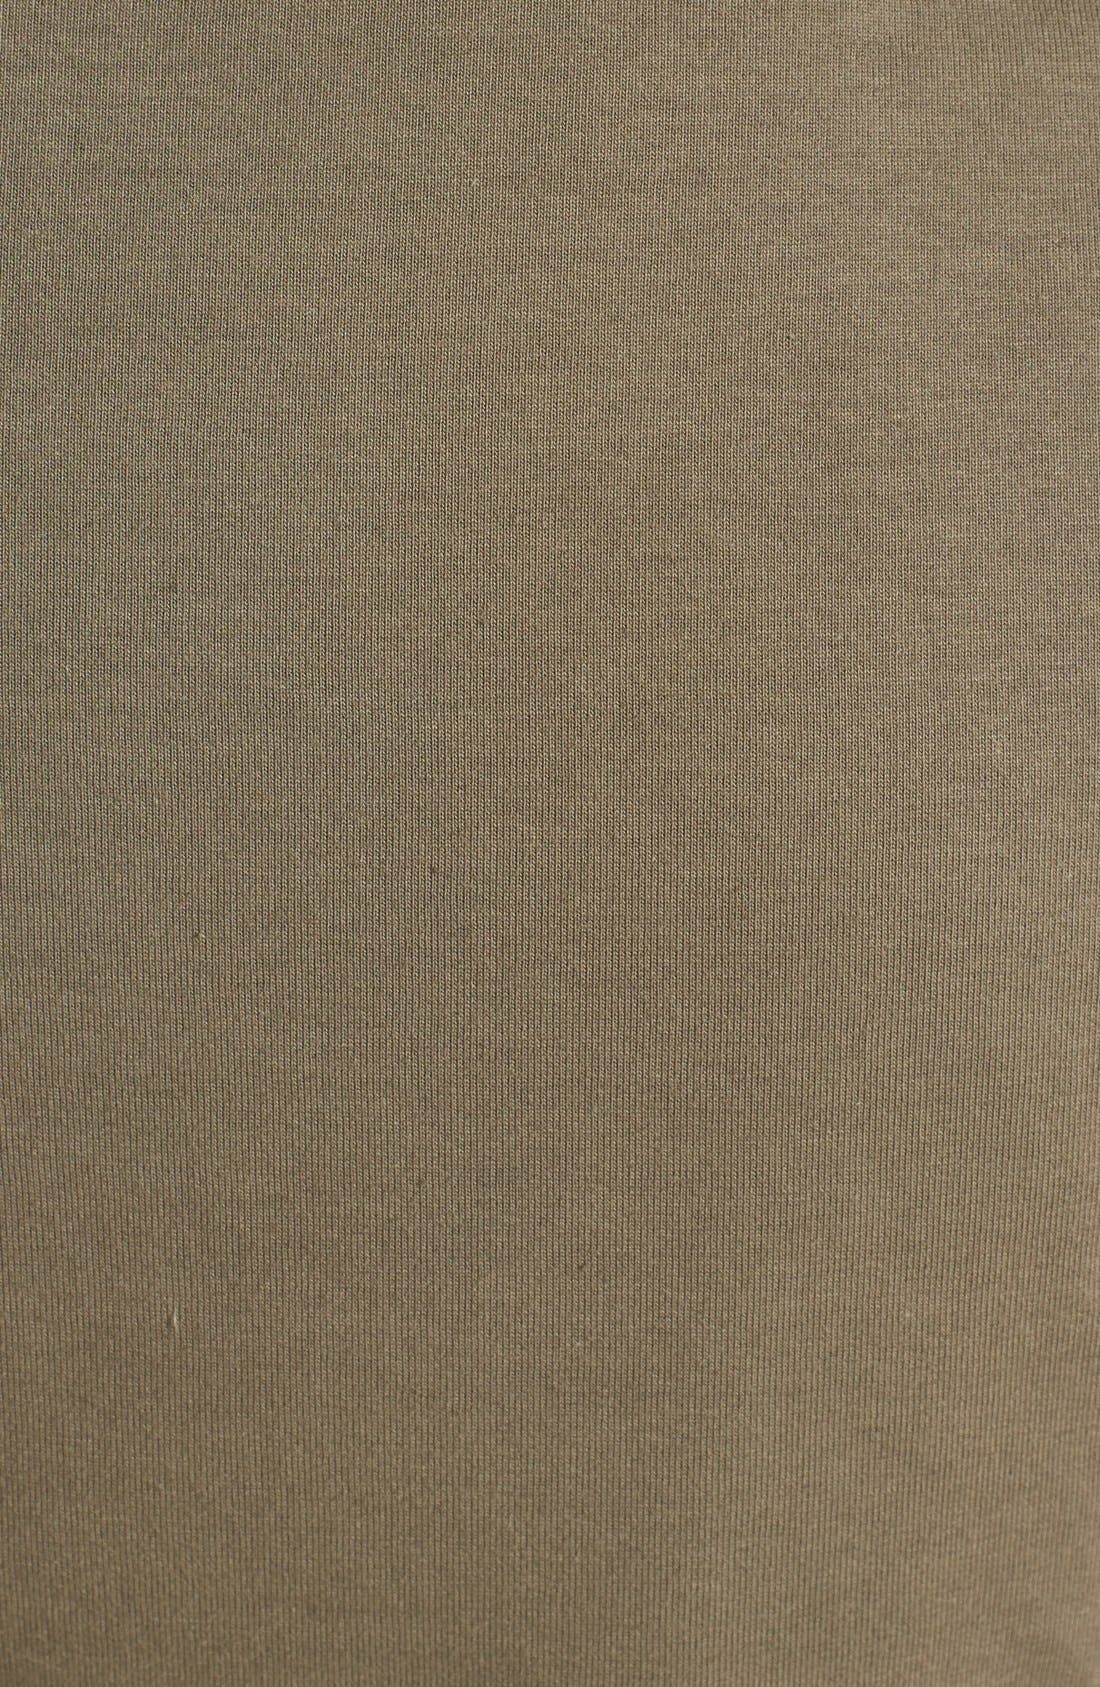 Alternate Image 3  - Splendid 'Bridger' Cotton Moto Vest (Nordstrom Online Exclusive)